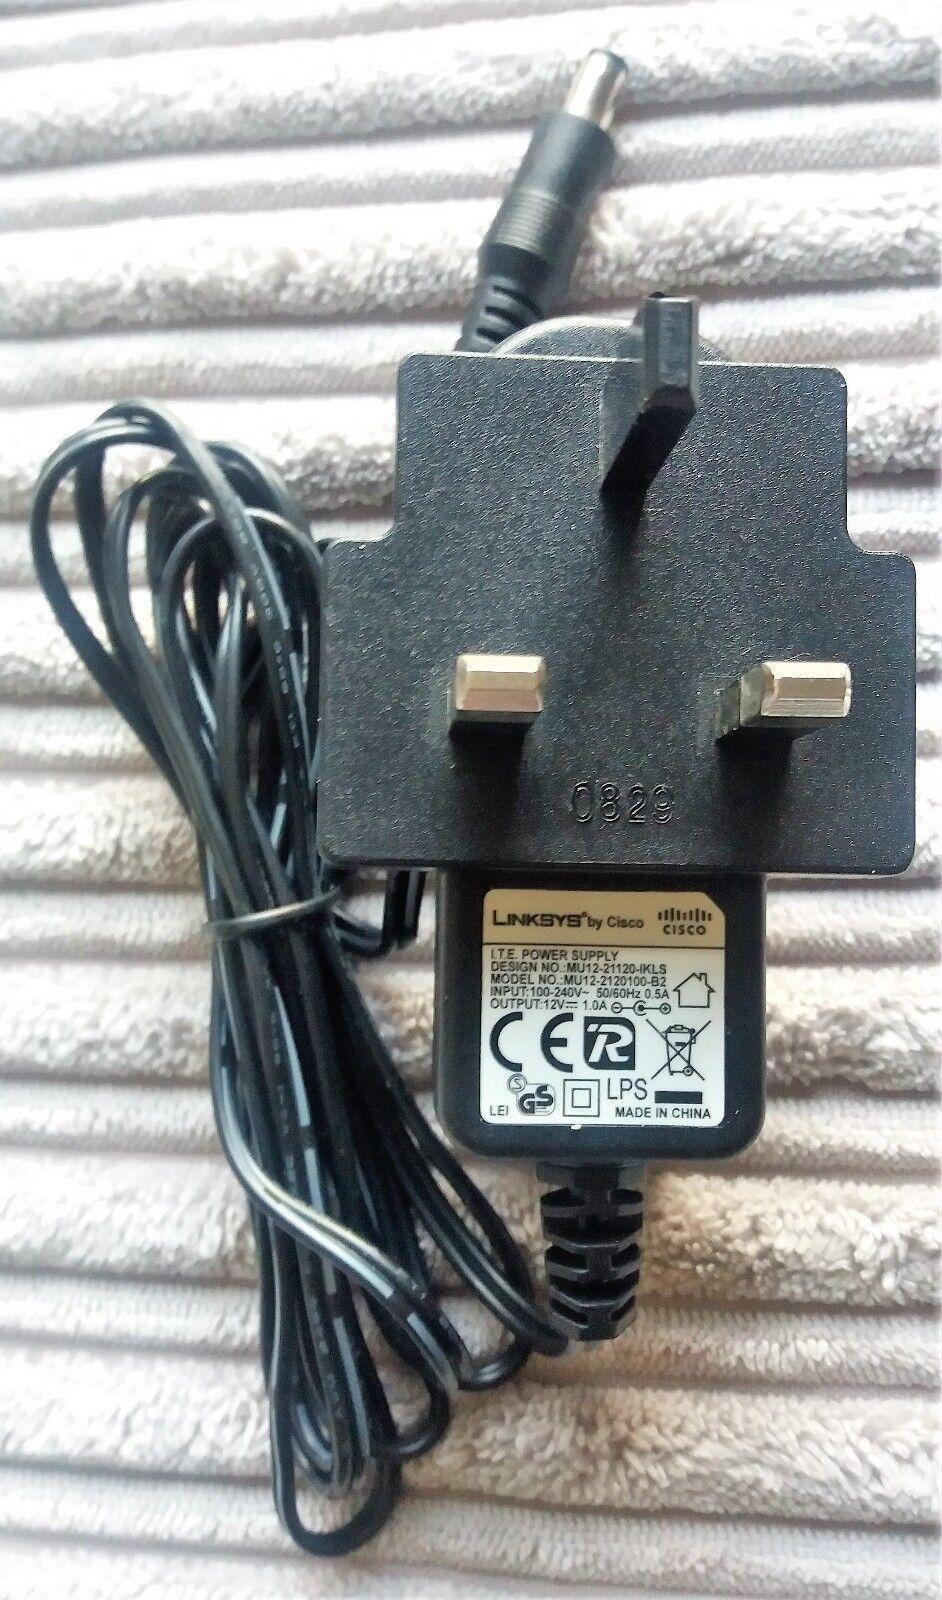 Linksys I.T.E Power Supply MU-2120100-B2 12V 1.0A